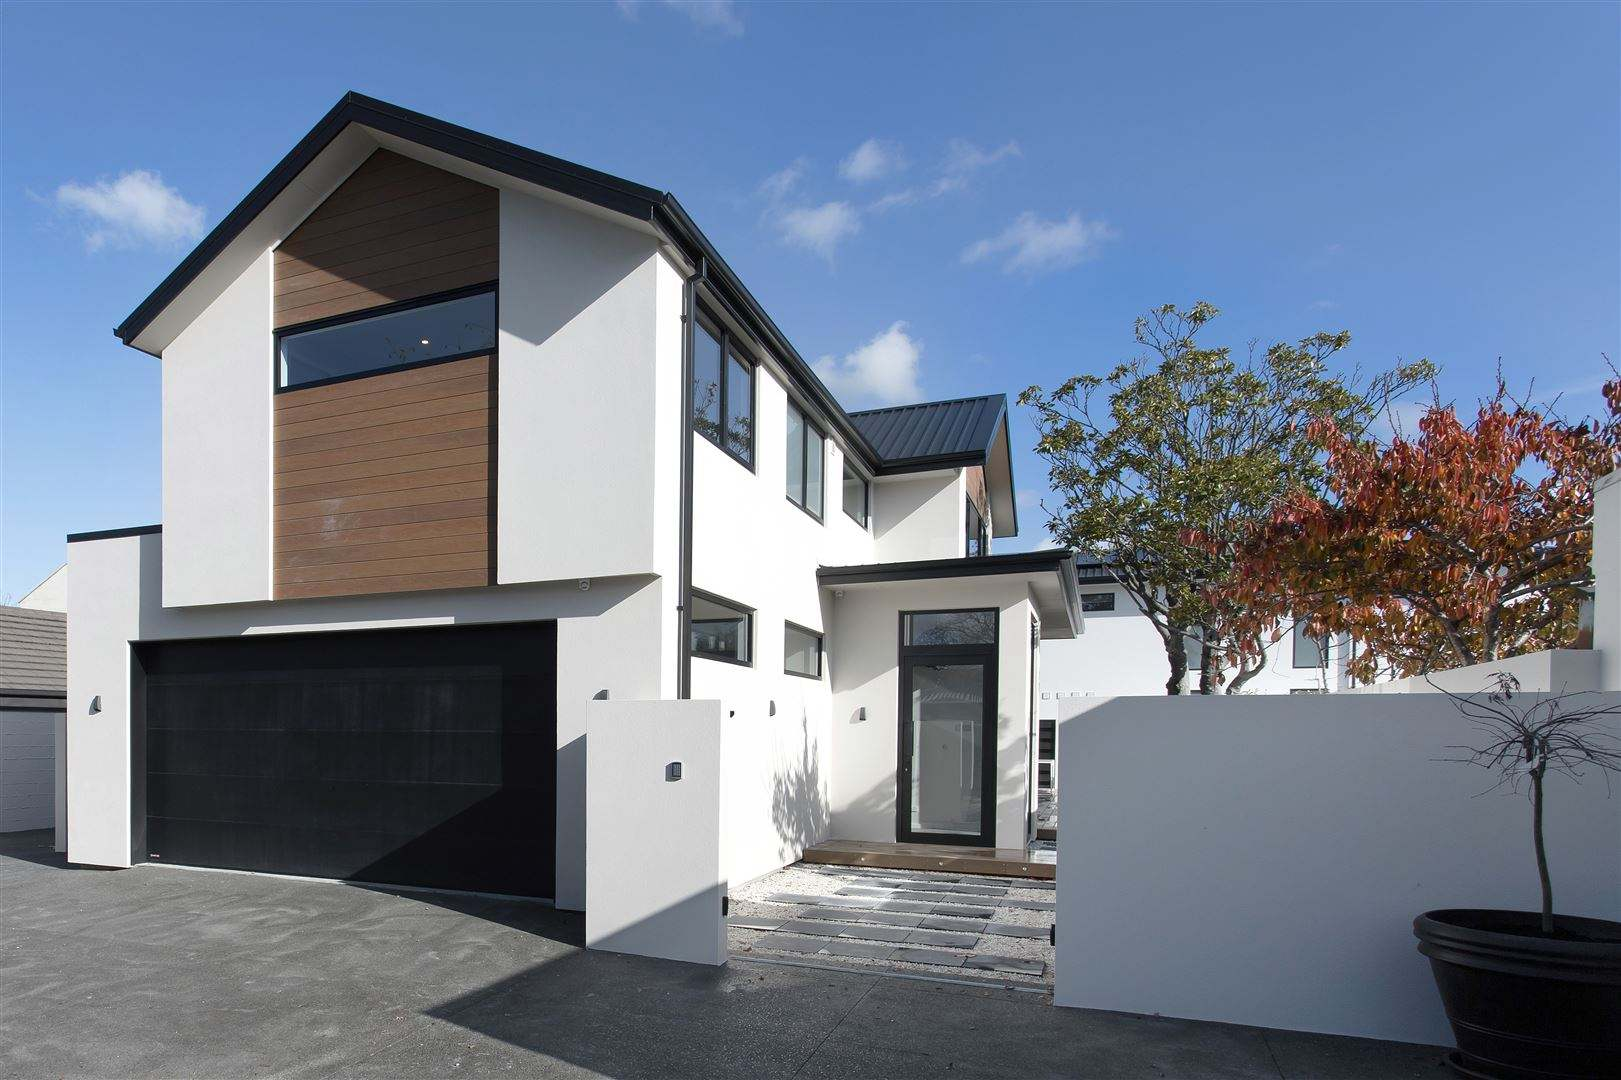 Fendalton 4房 So Much Light and Sun: Brand-New Executive Home